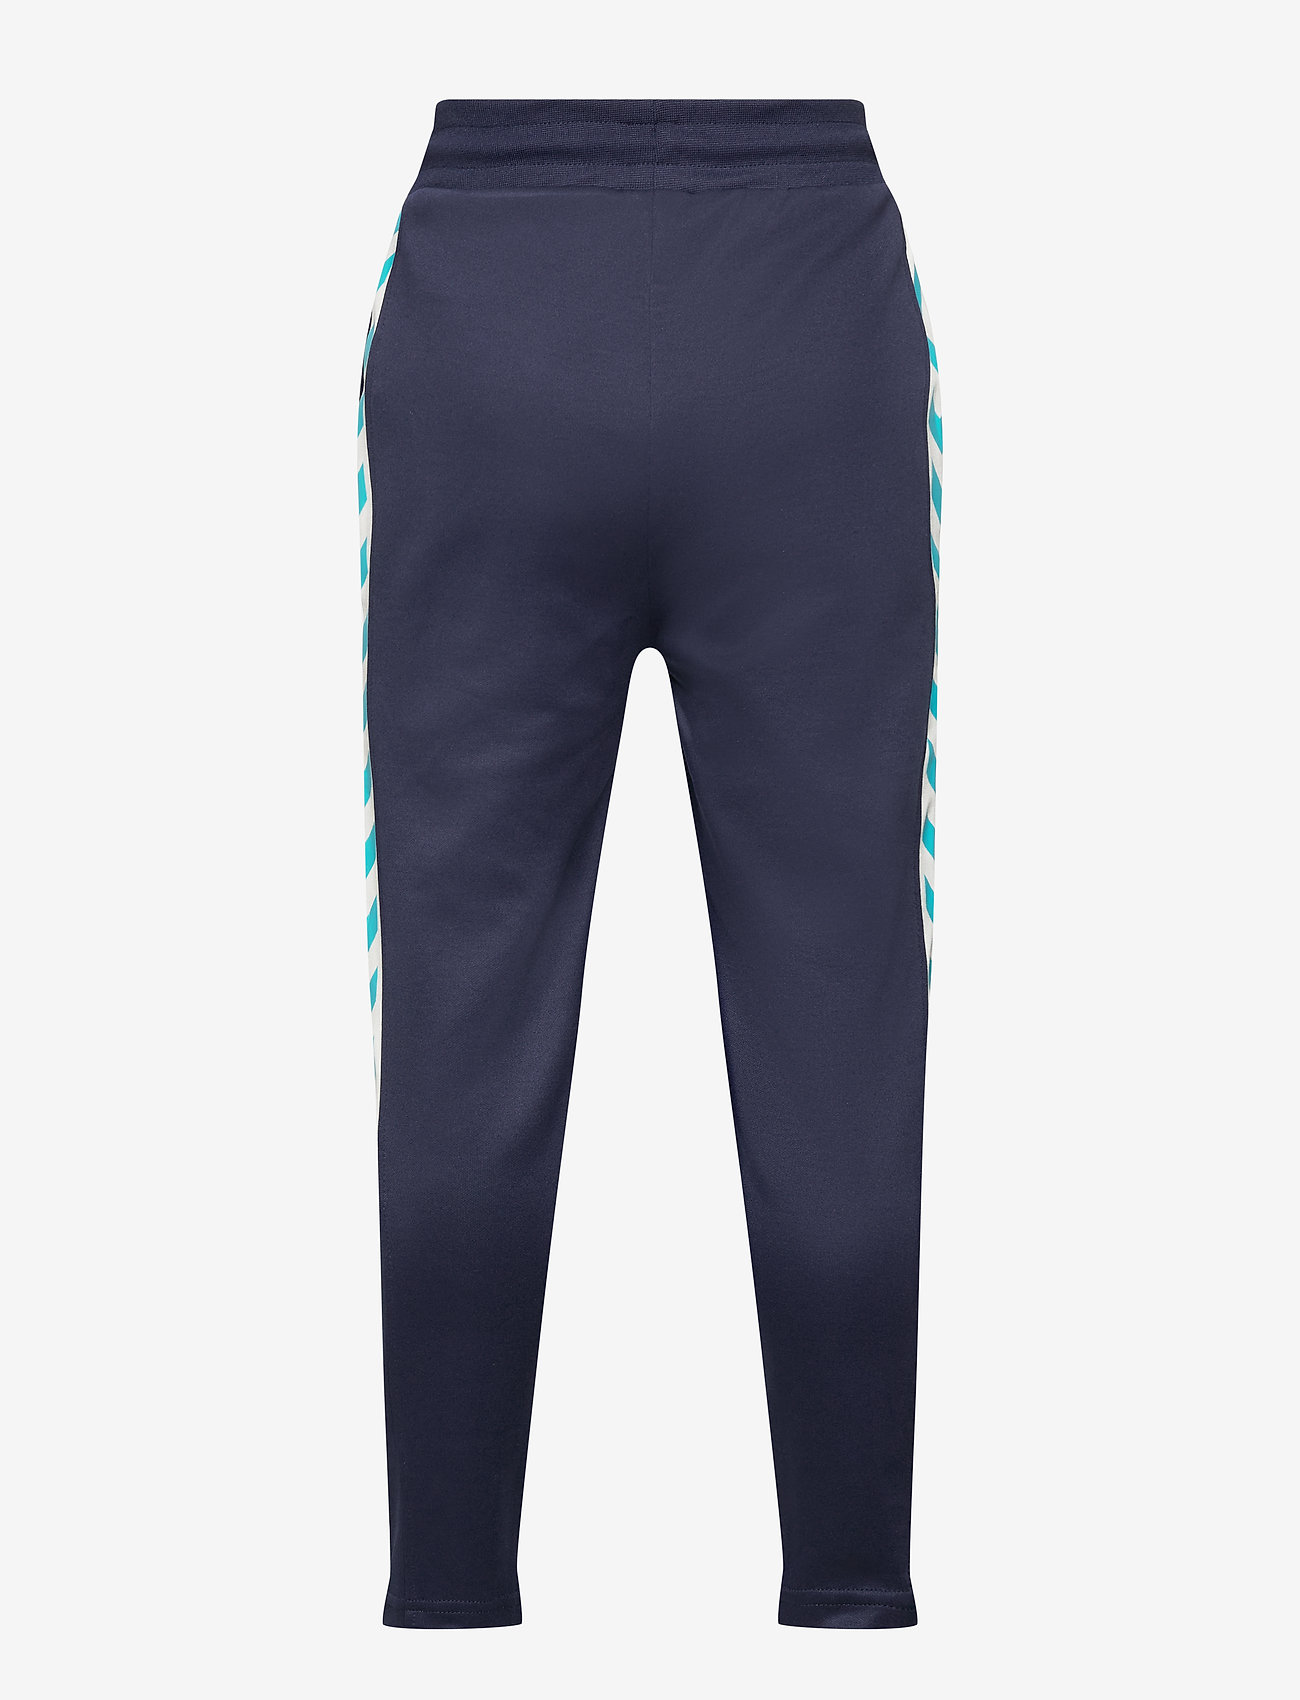 Hummel - hmlDENNIS PANTS - sweatpants - black iris - 1